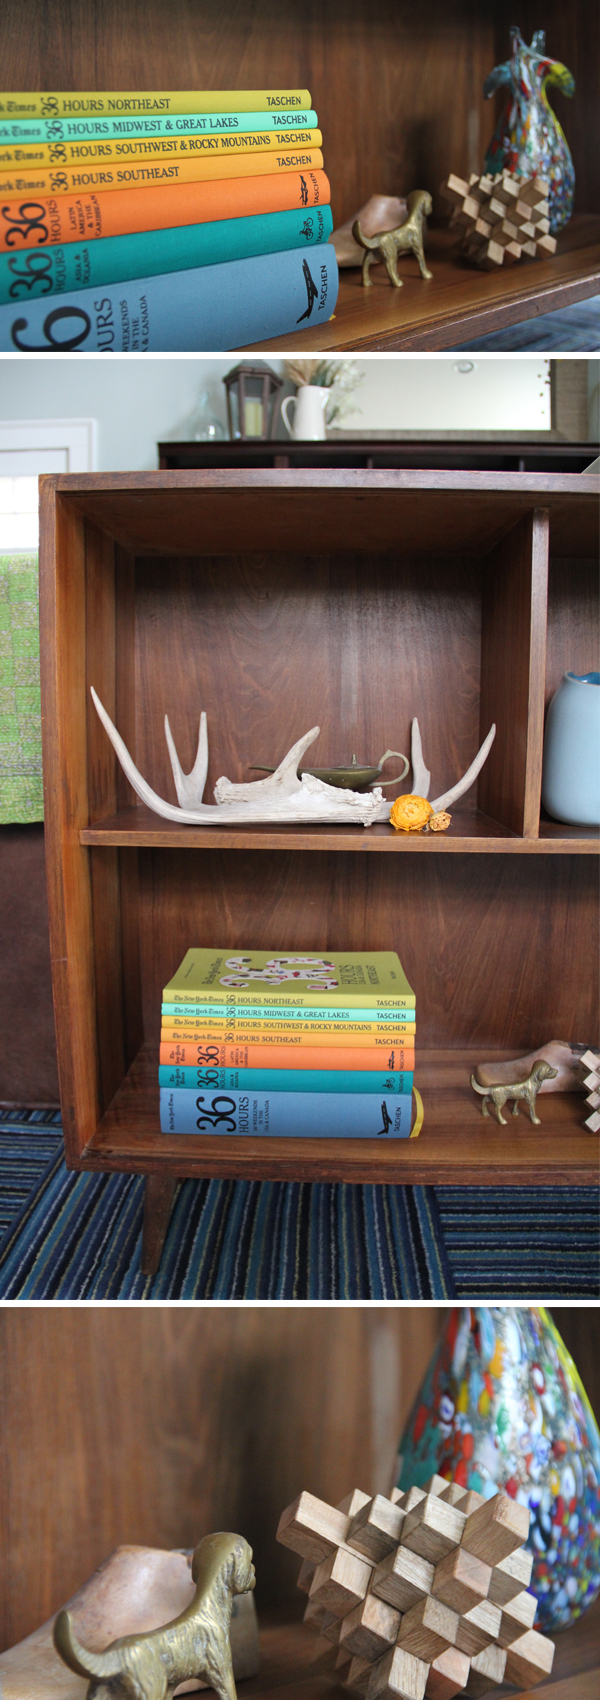 bookcase-closeup